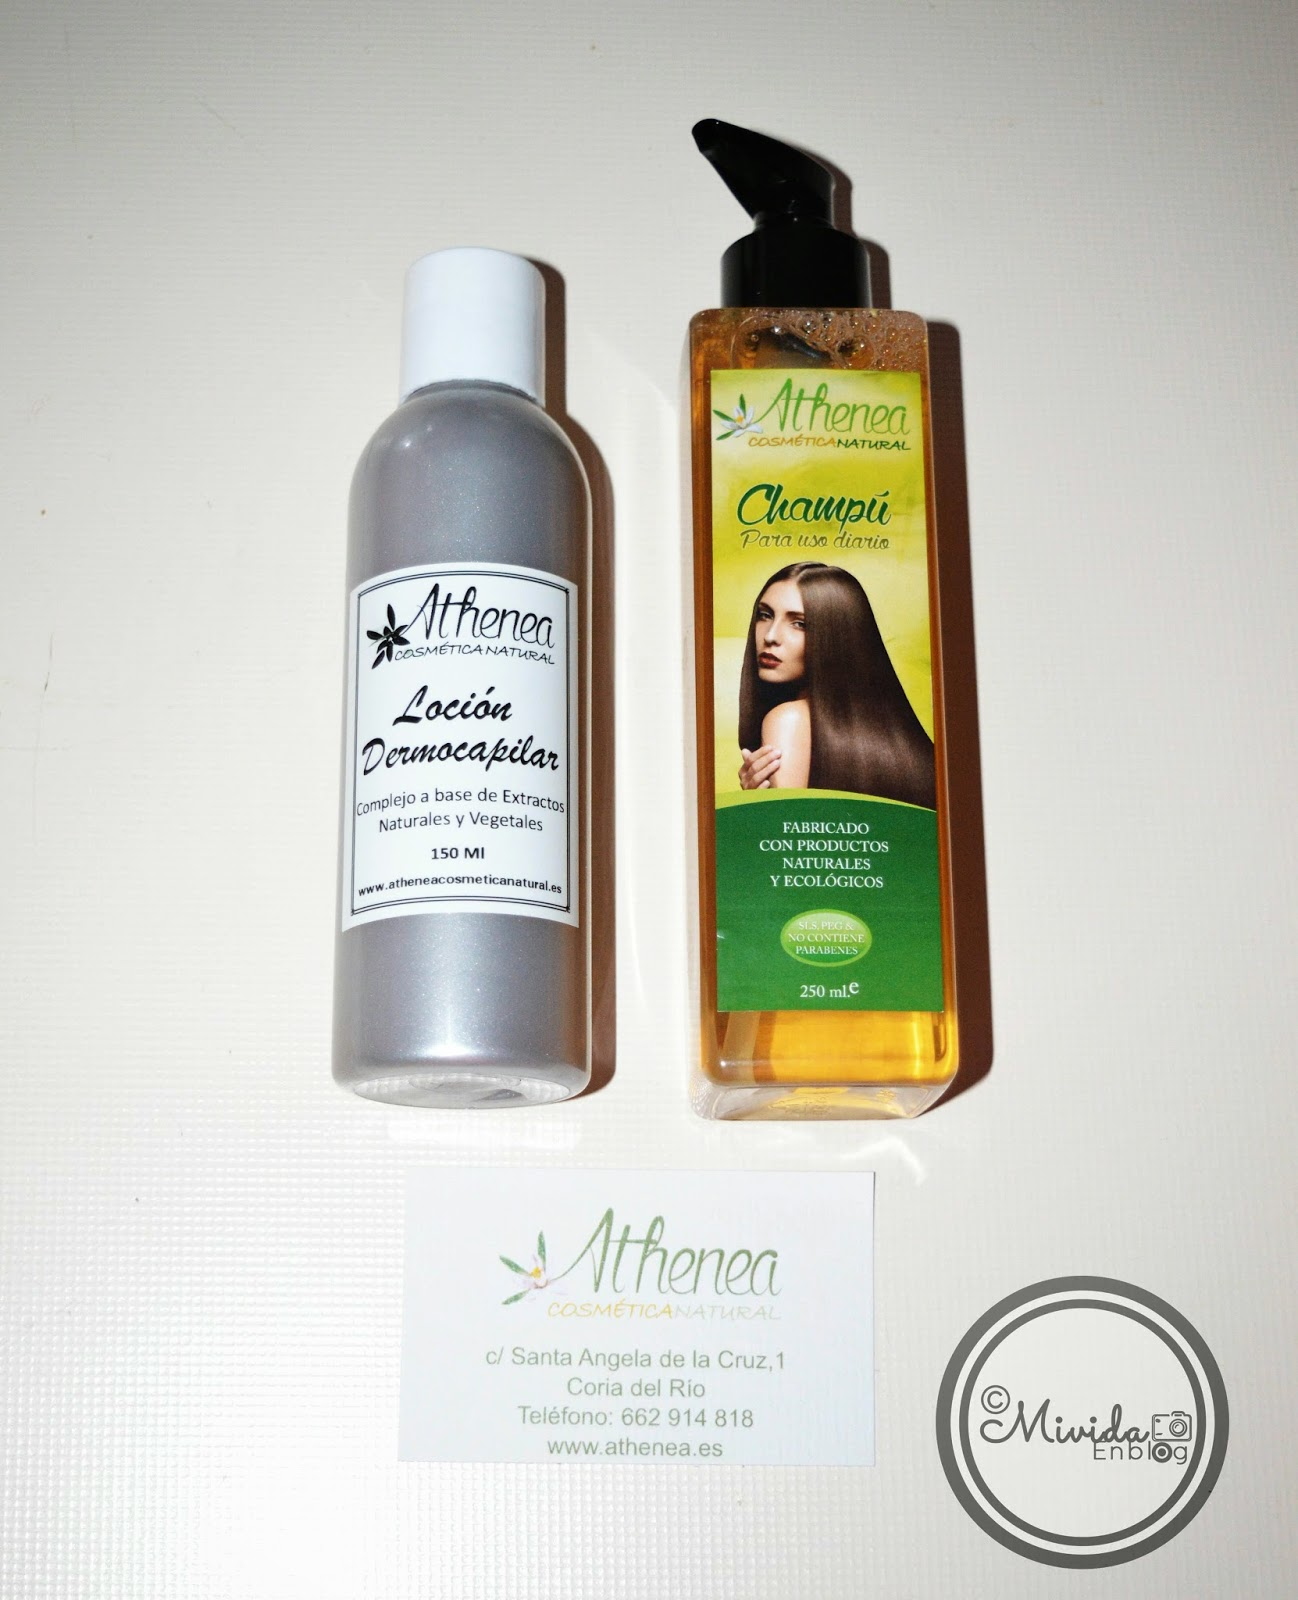 Champú de uso diario y loción capilar de Athenea cosmética natural